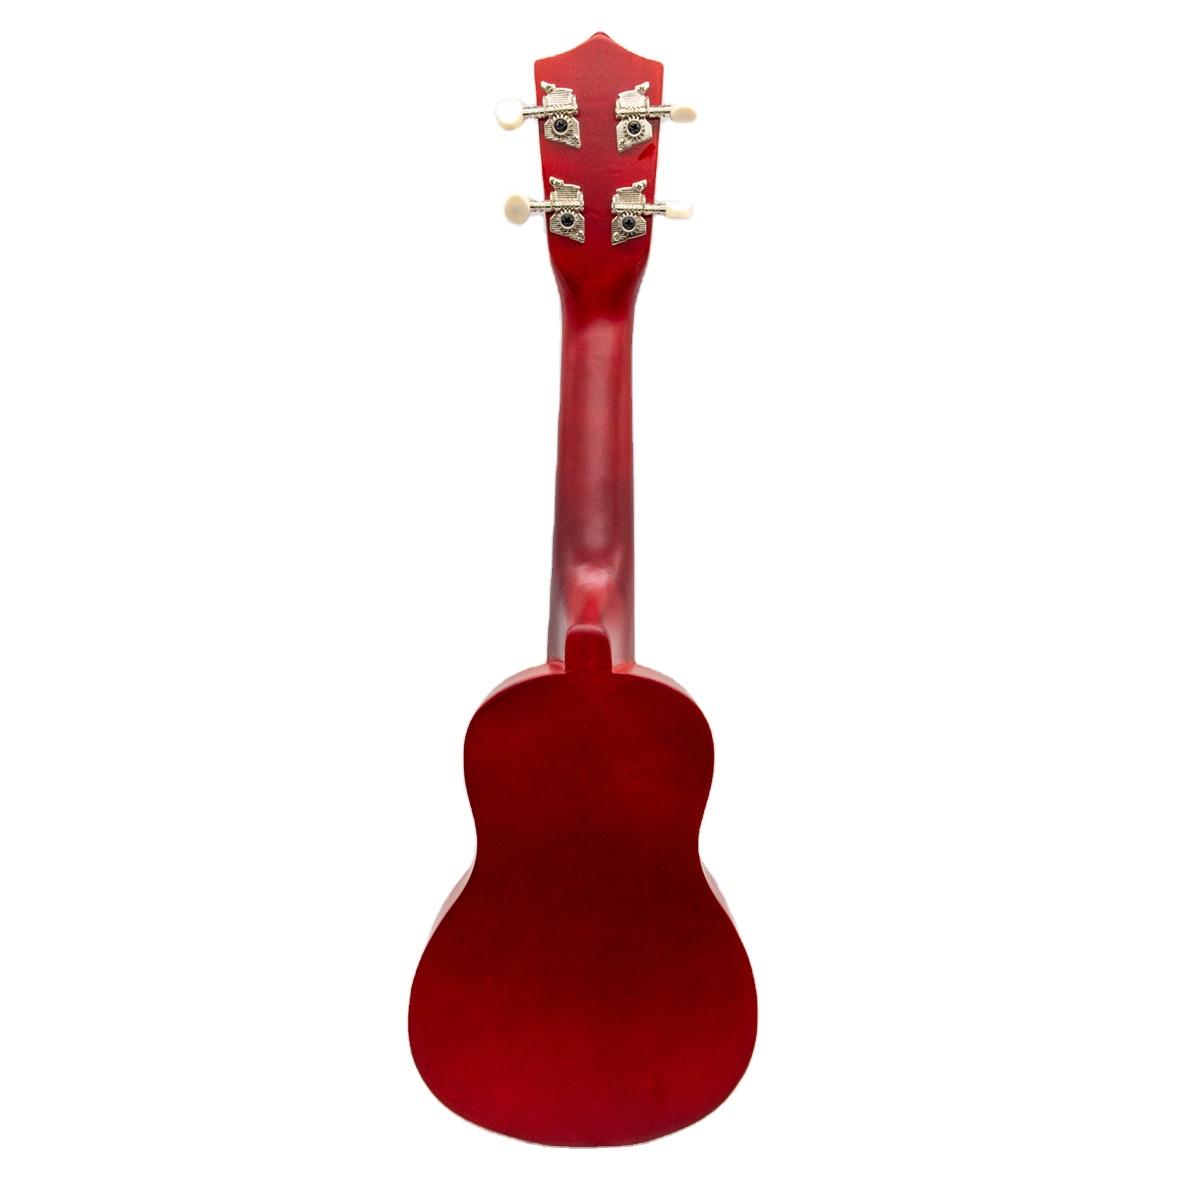 Licht Gewicht Custom gitarre Rot Bariton Solide Mahagoni Ukulele